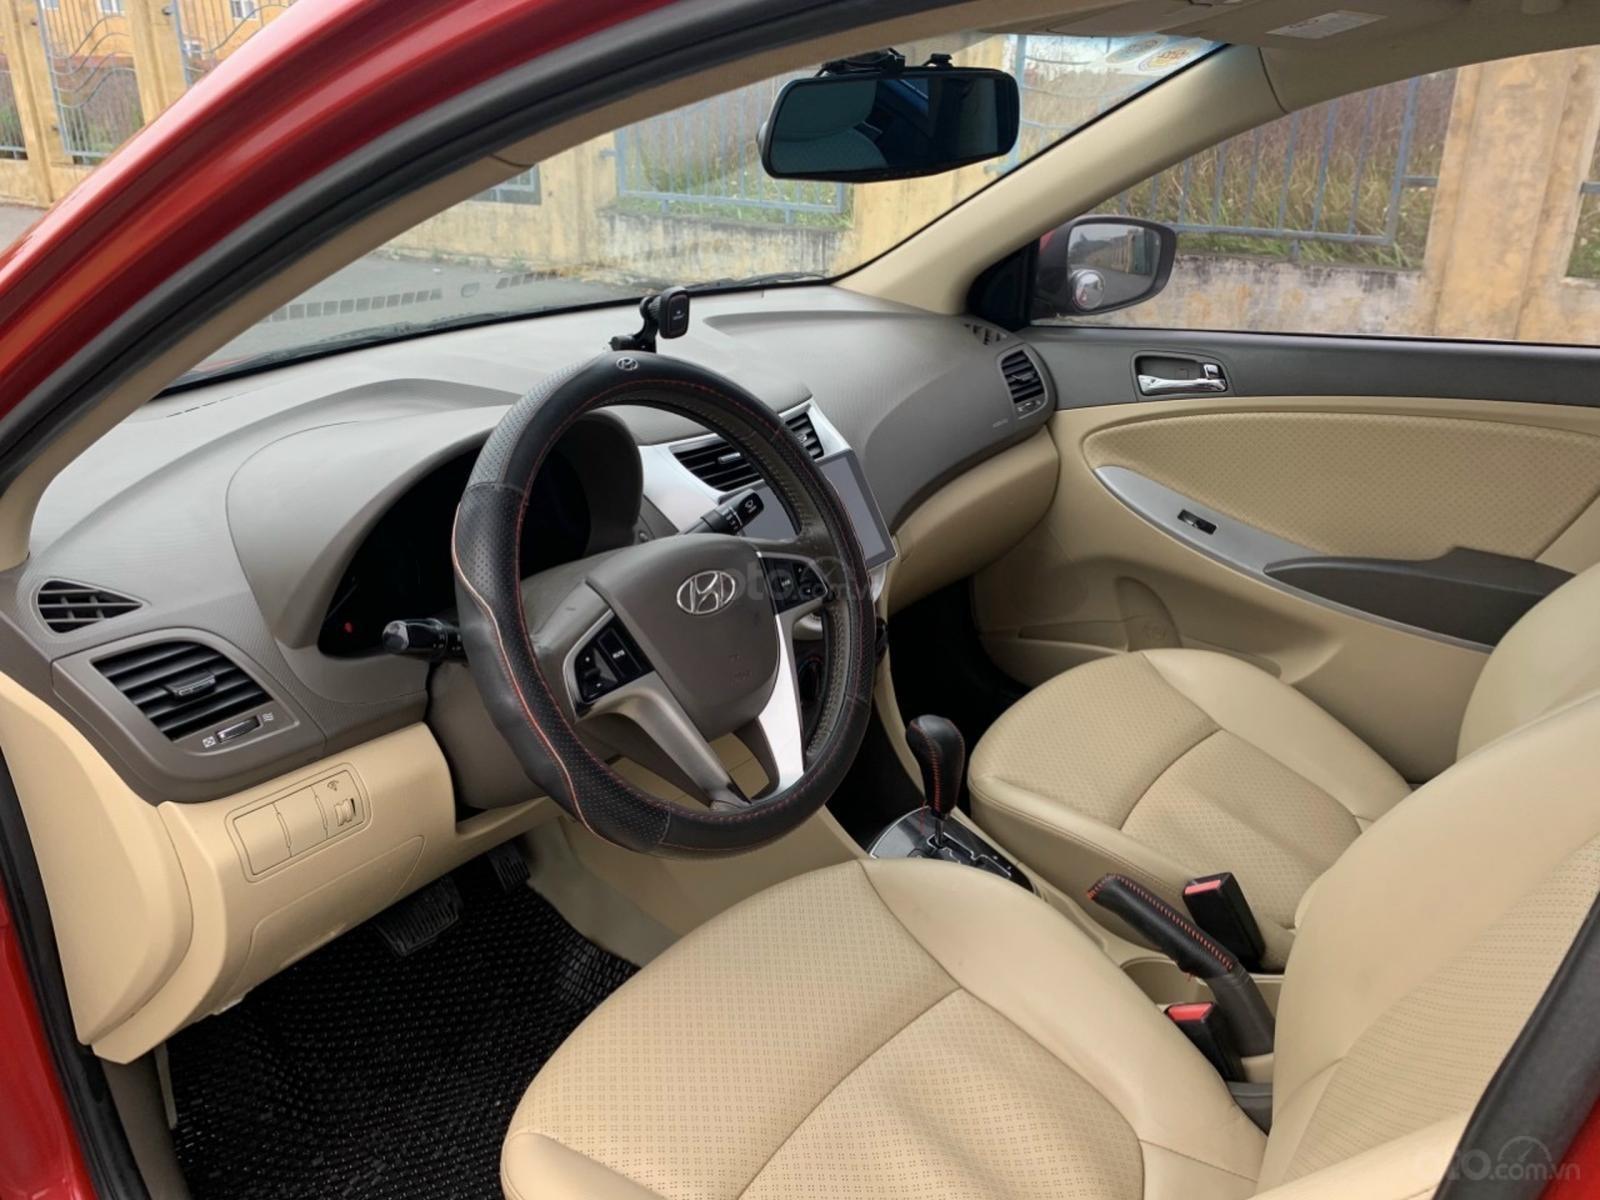 Hyundai Accent 1.4 MT 2011, giá 348tr (7)